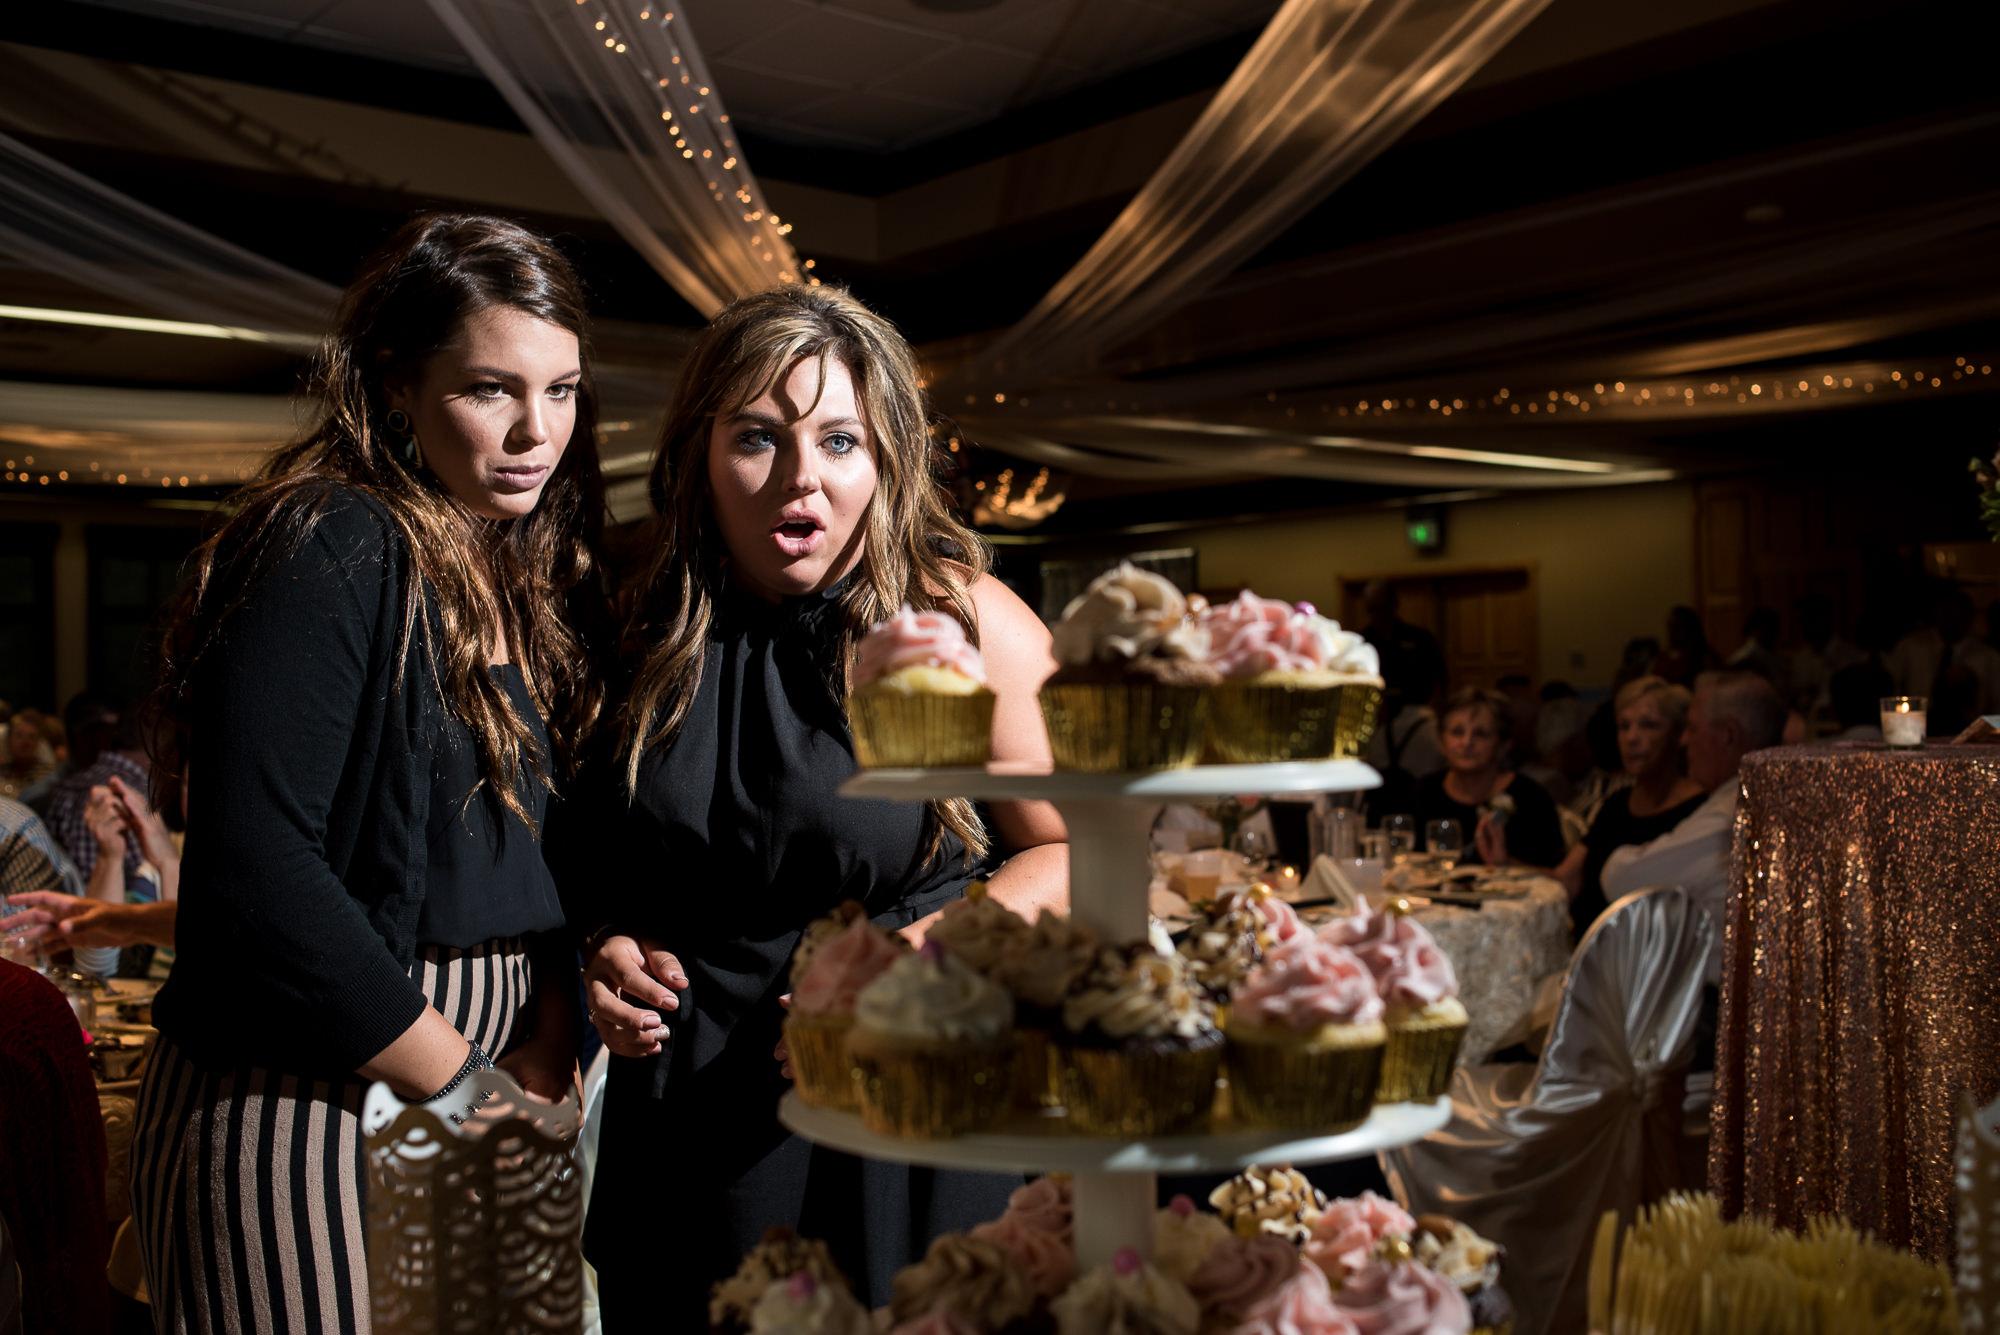 DAKOTA-DUNES-WEDDING-SOUTH-DAKOTA-WEDDING-PHOTOGRAPHER-0023.jpg